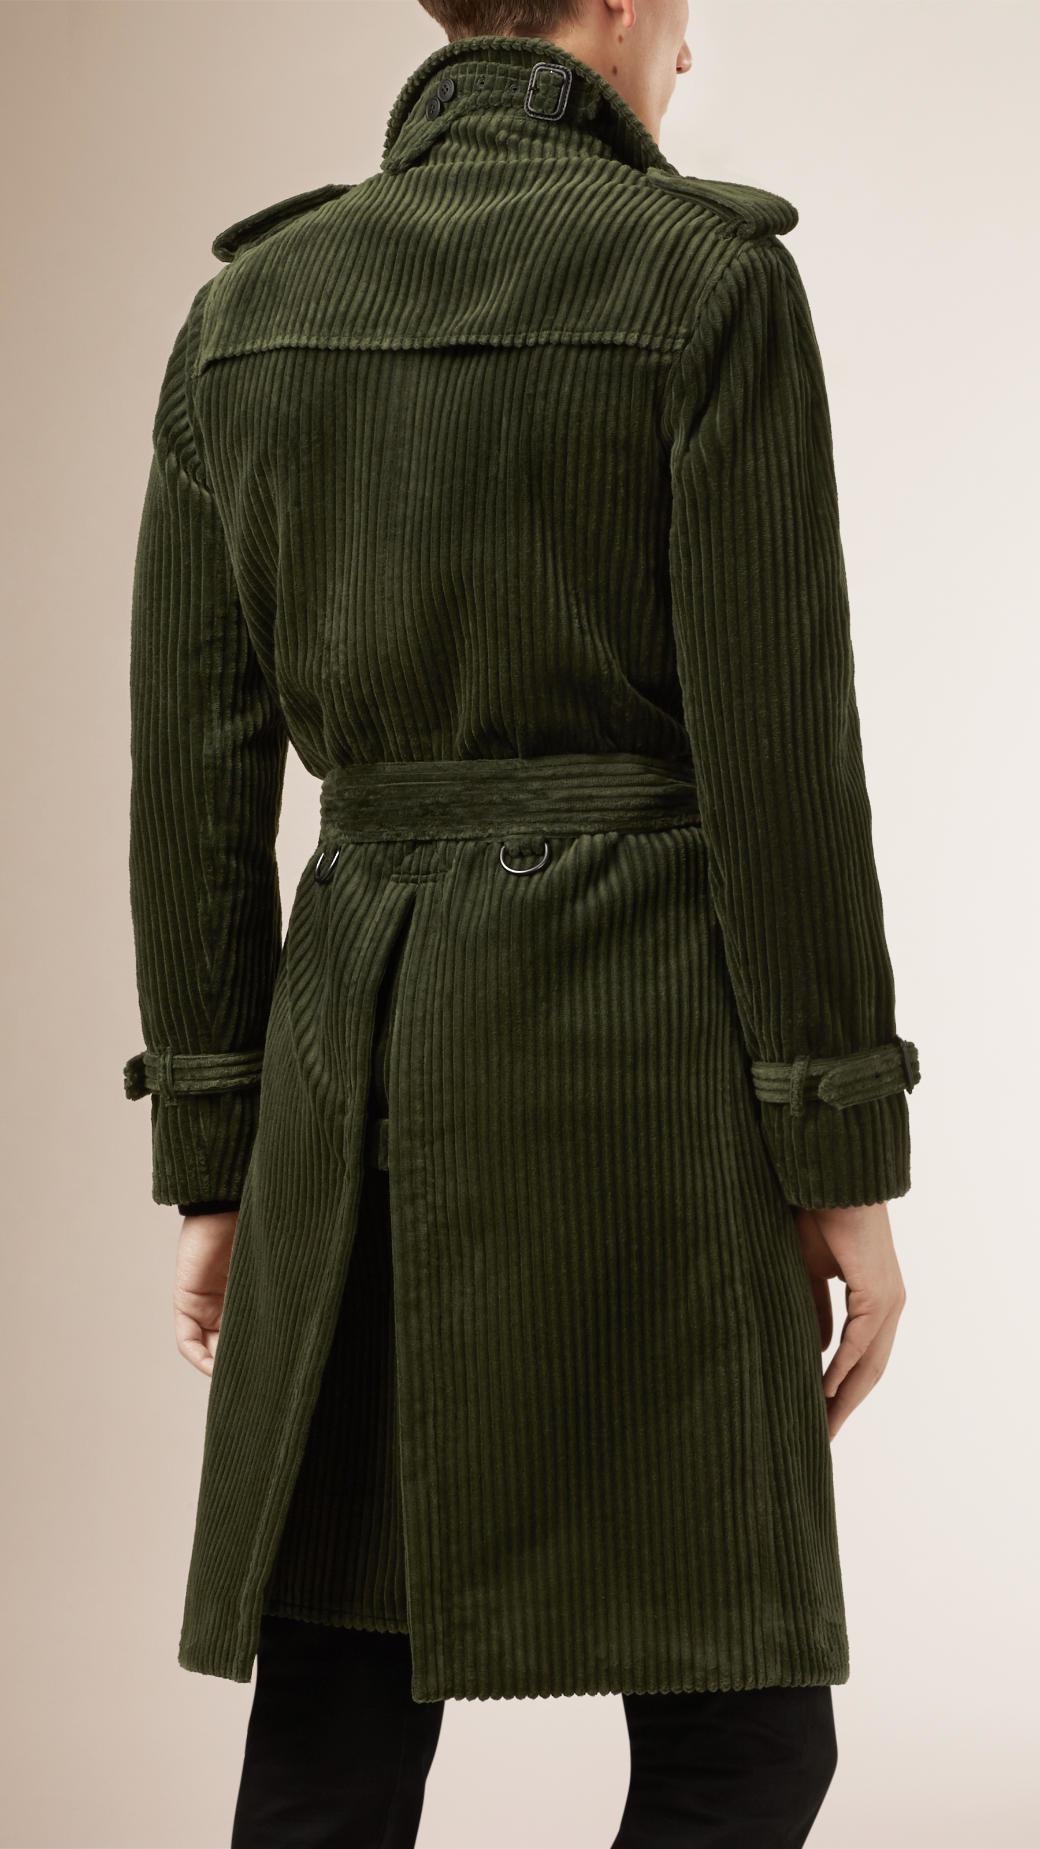 Lyst Burberry Corduroy Trench Coat In Green For Men